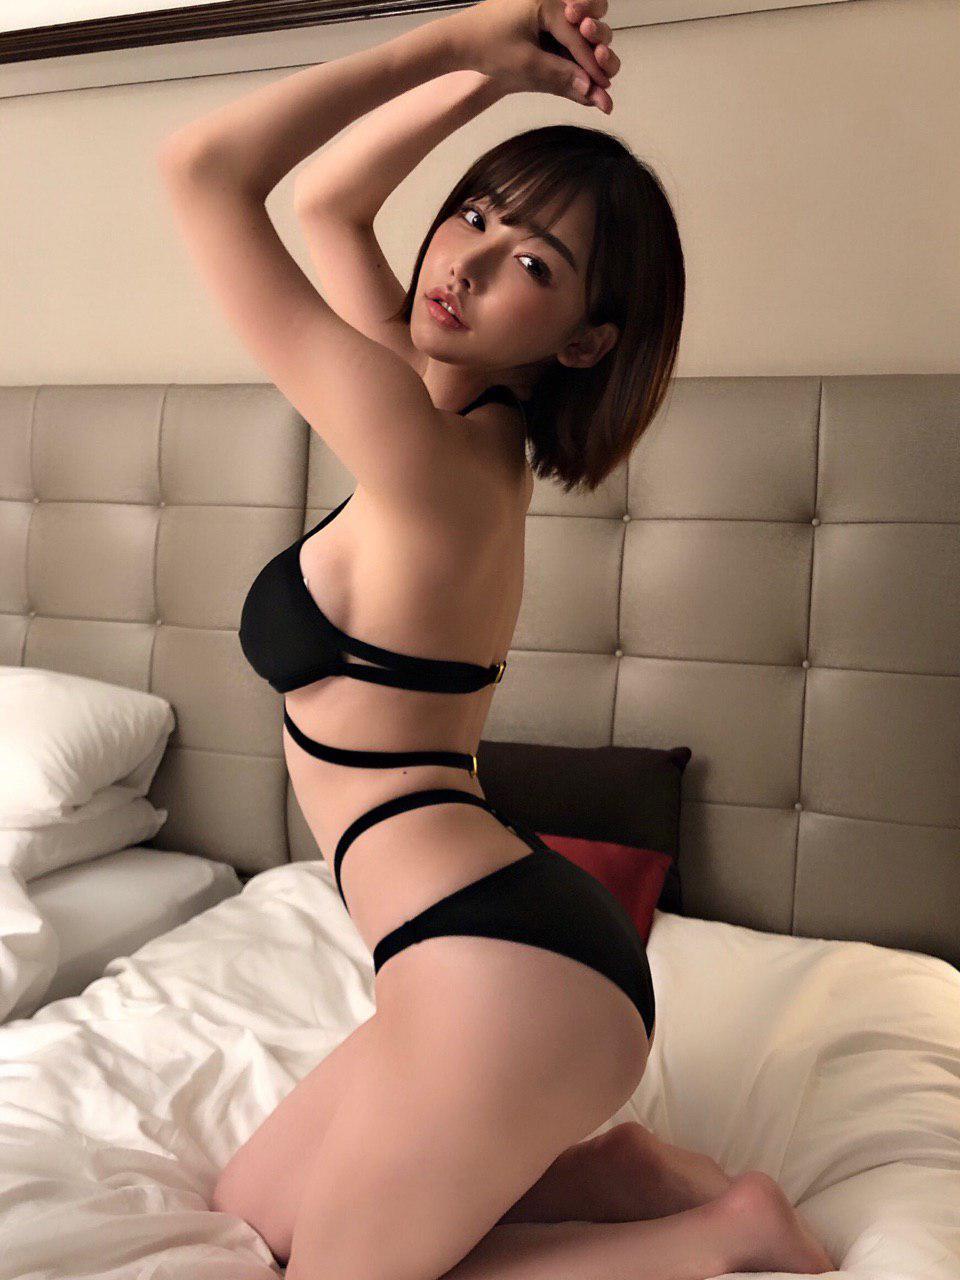 photo_2019-08-21_13-08-01.jpg